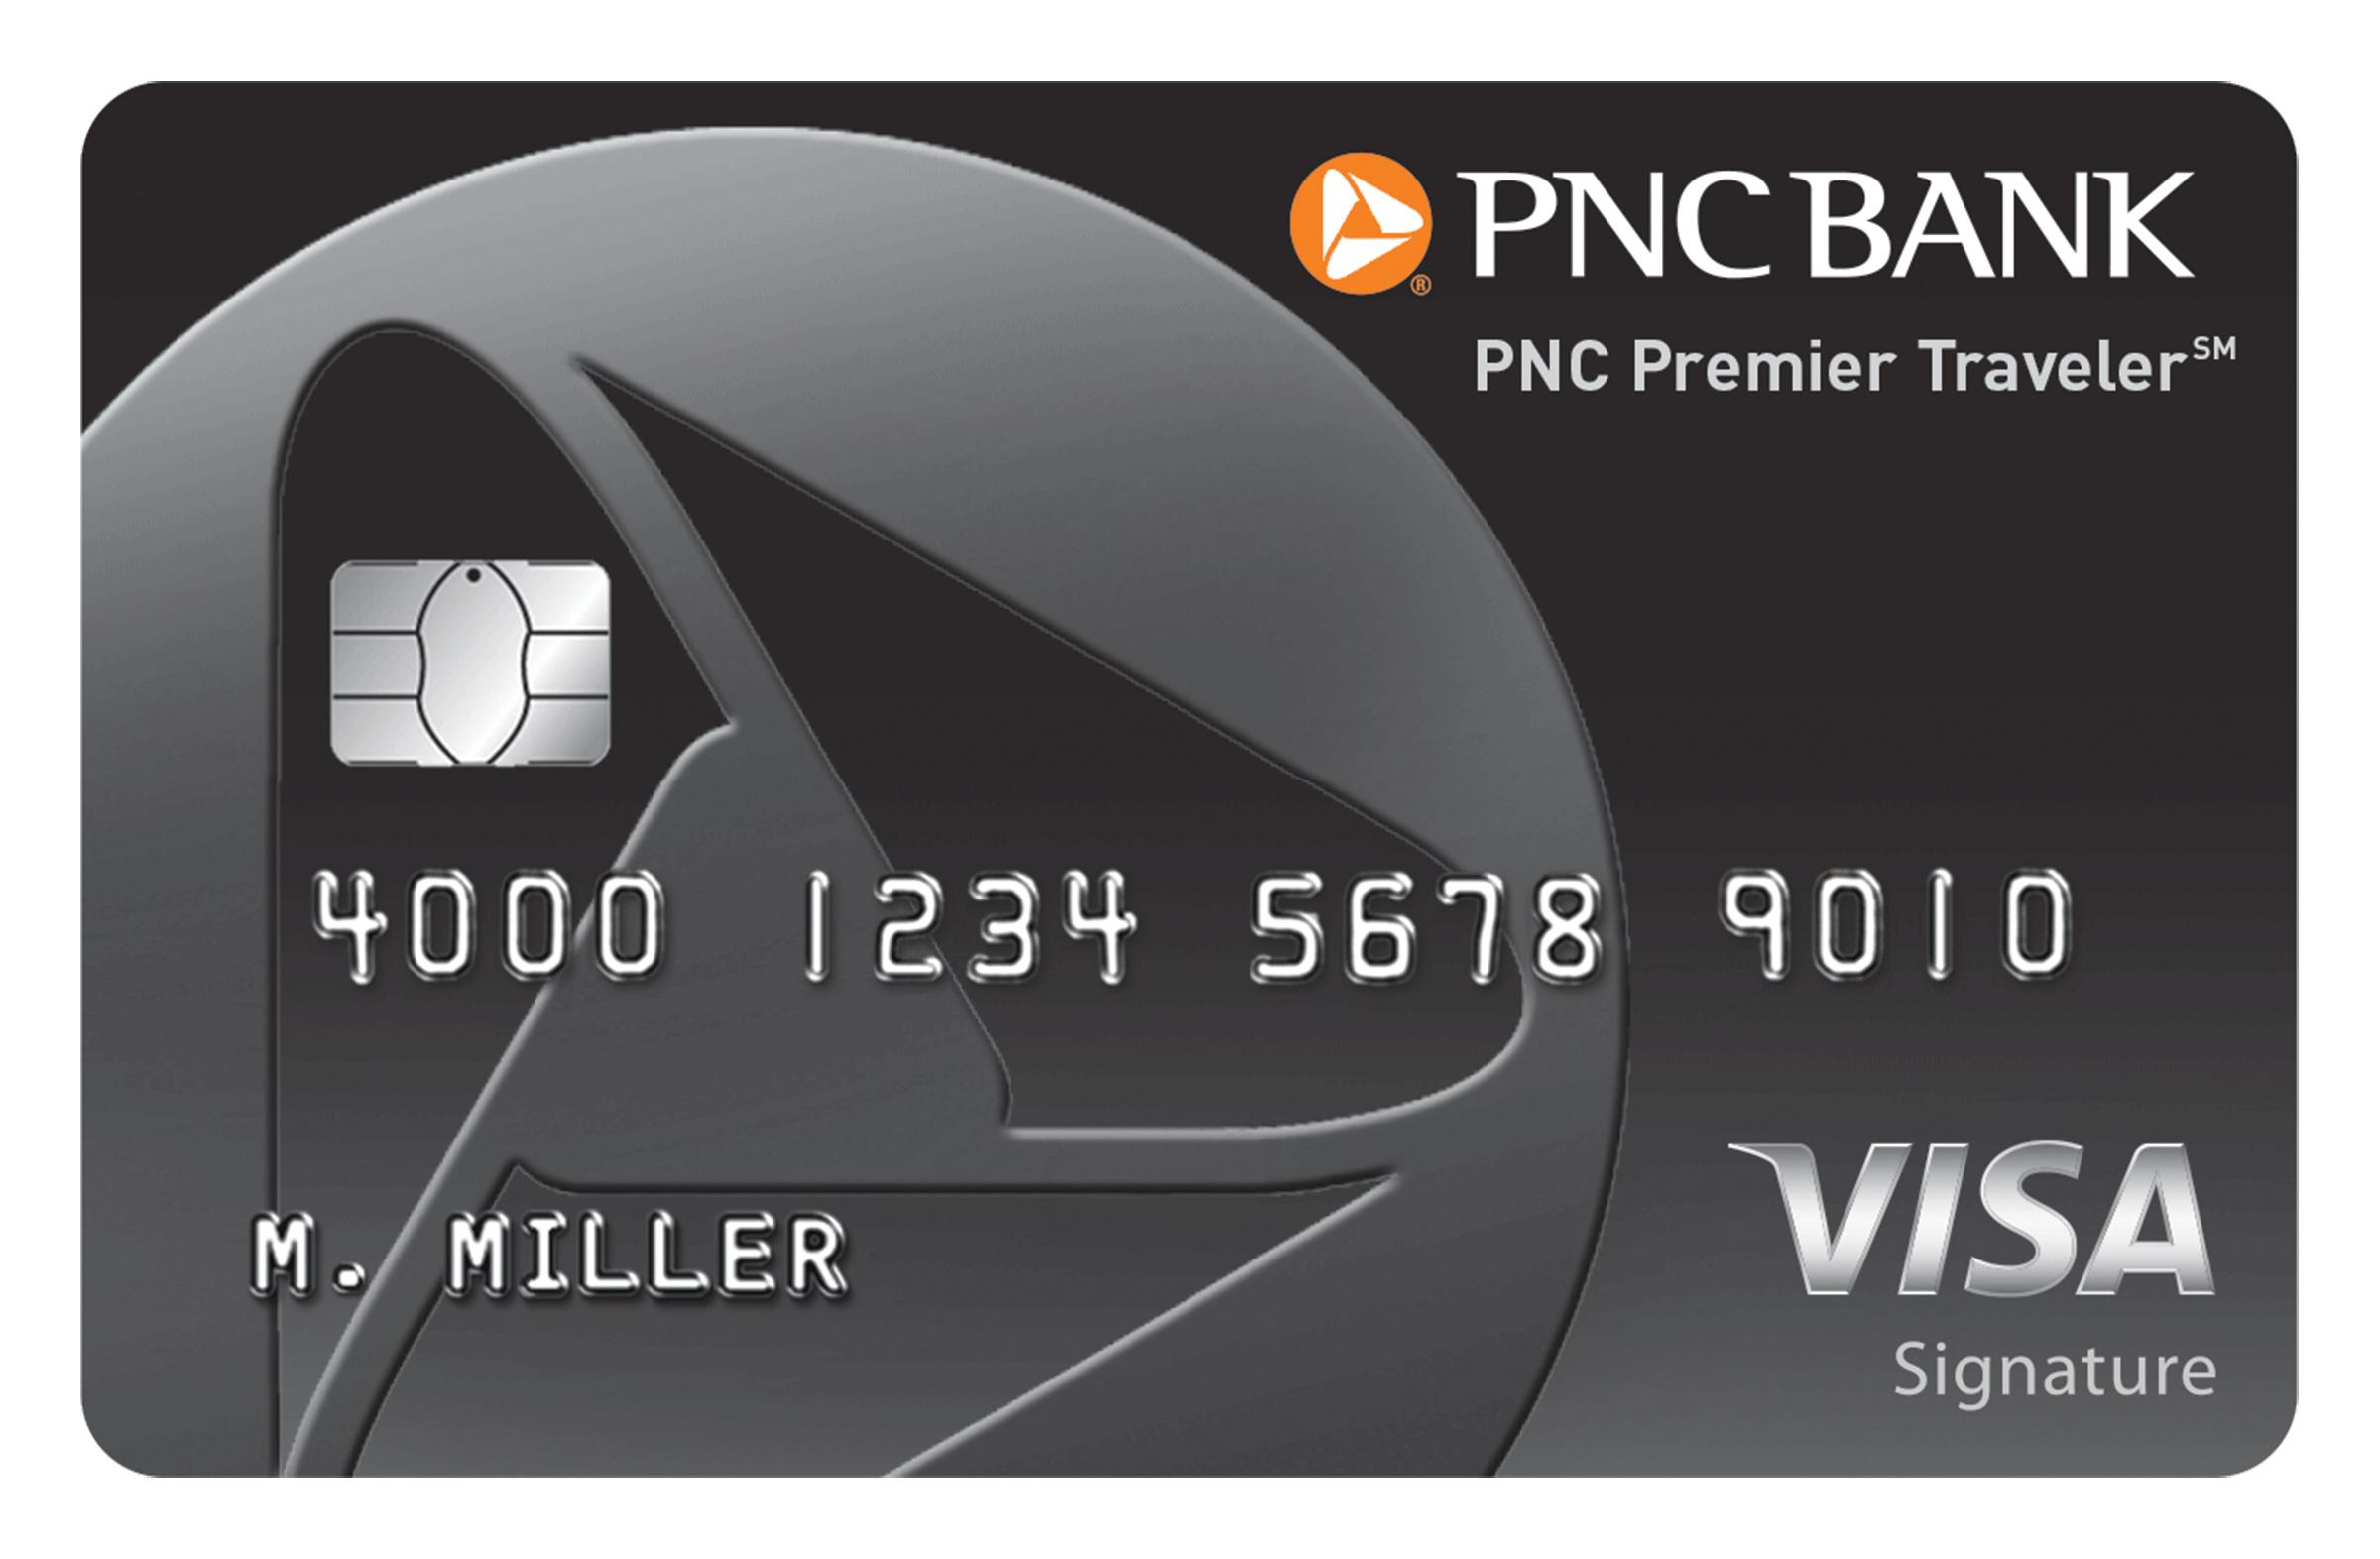 Pnc Premier Traveler Visa Signature Credit Card How Much